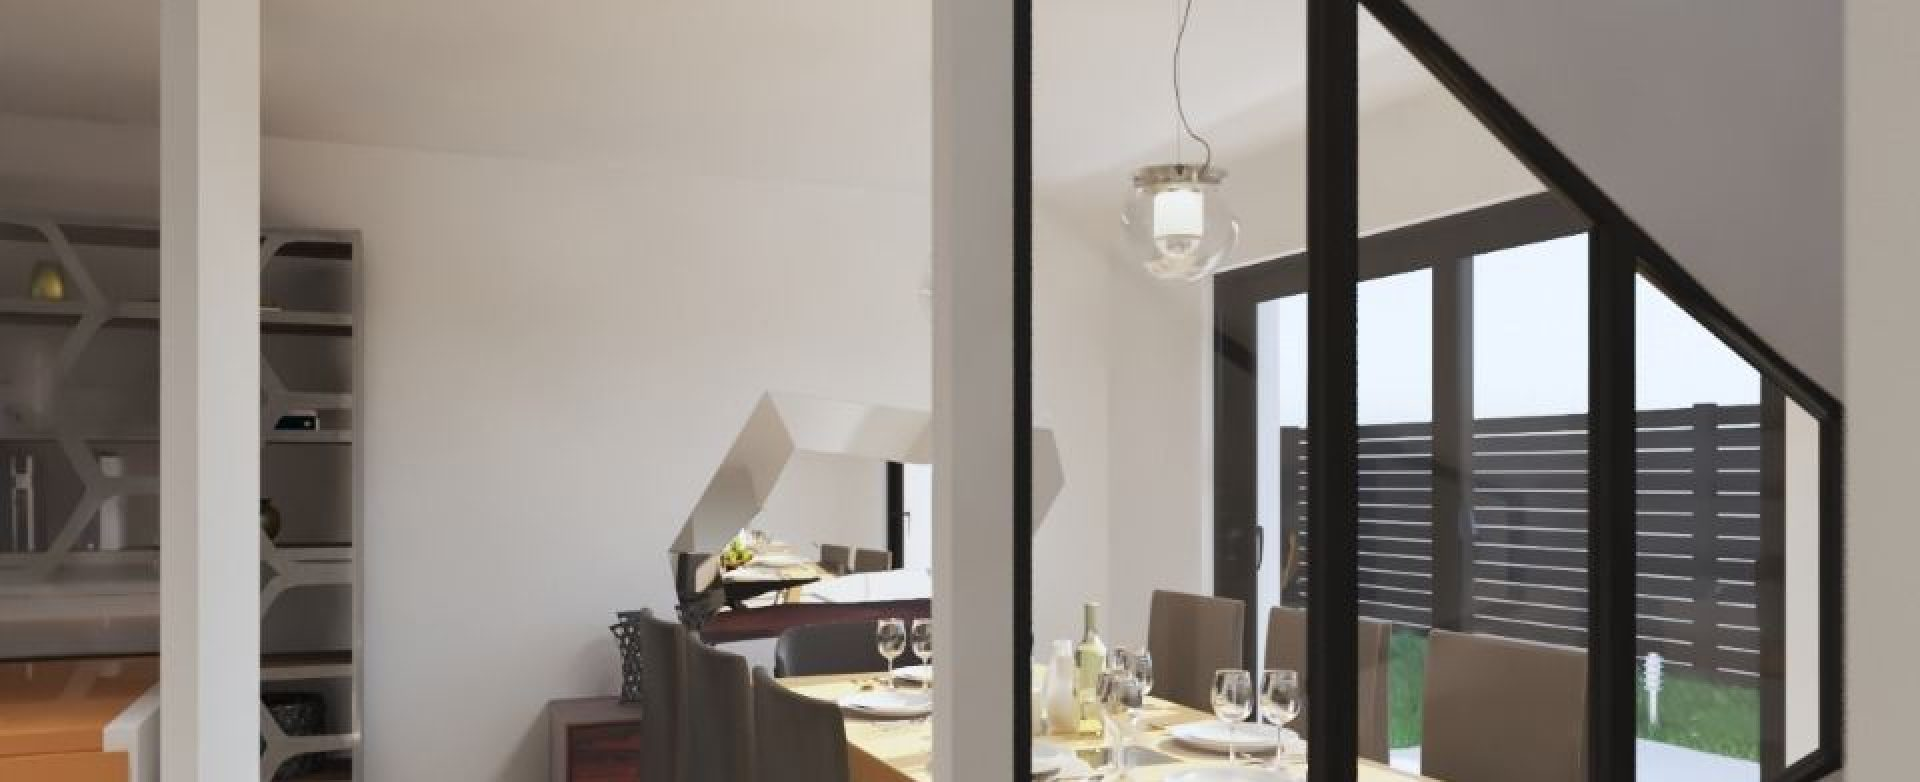 Maison neuve à Saint Germain lès Arpajon (91180)